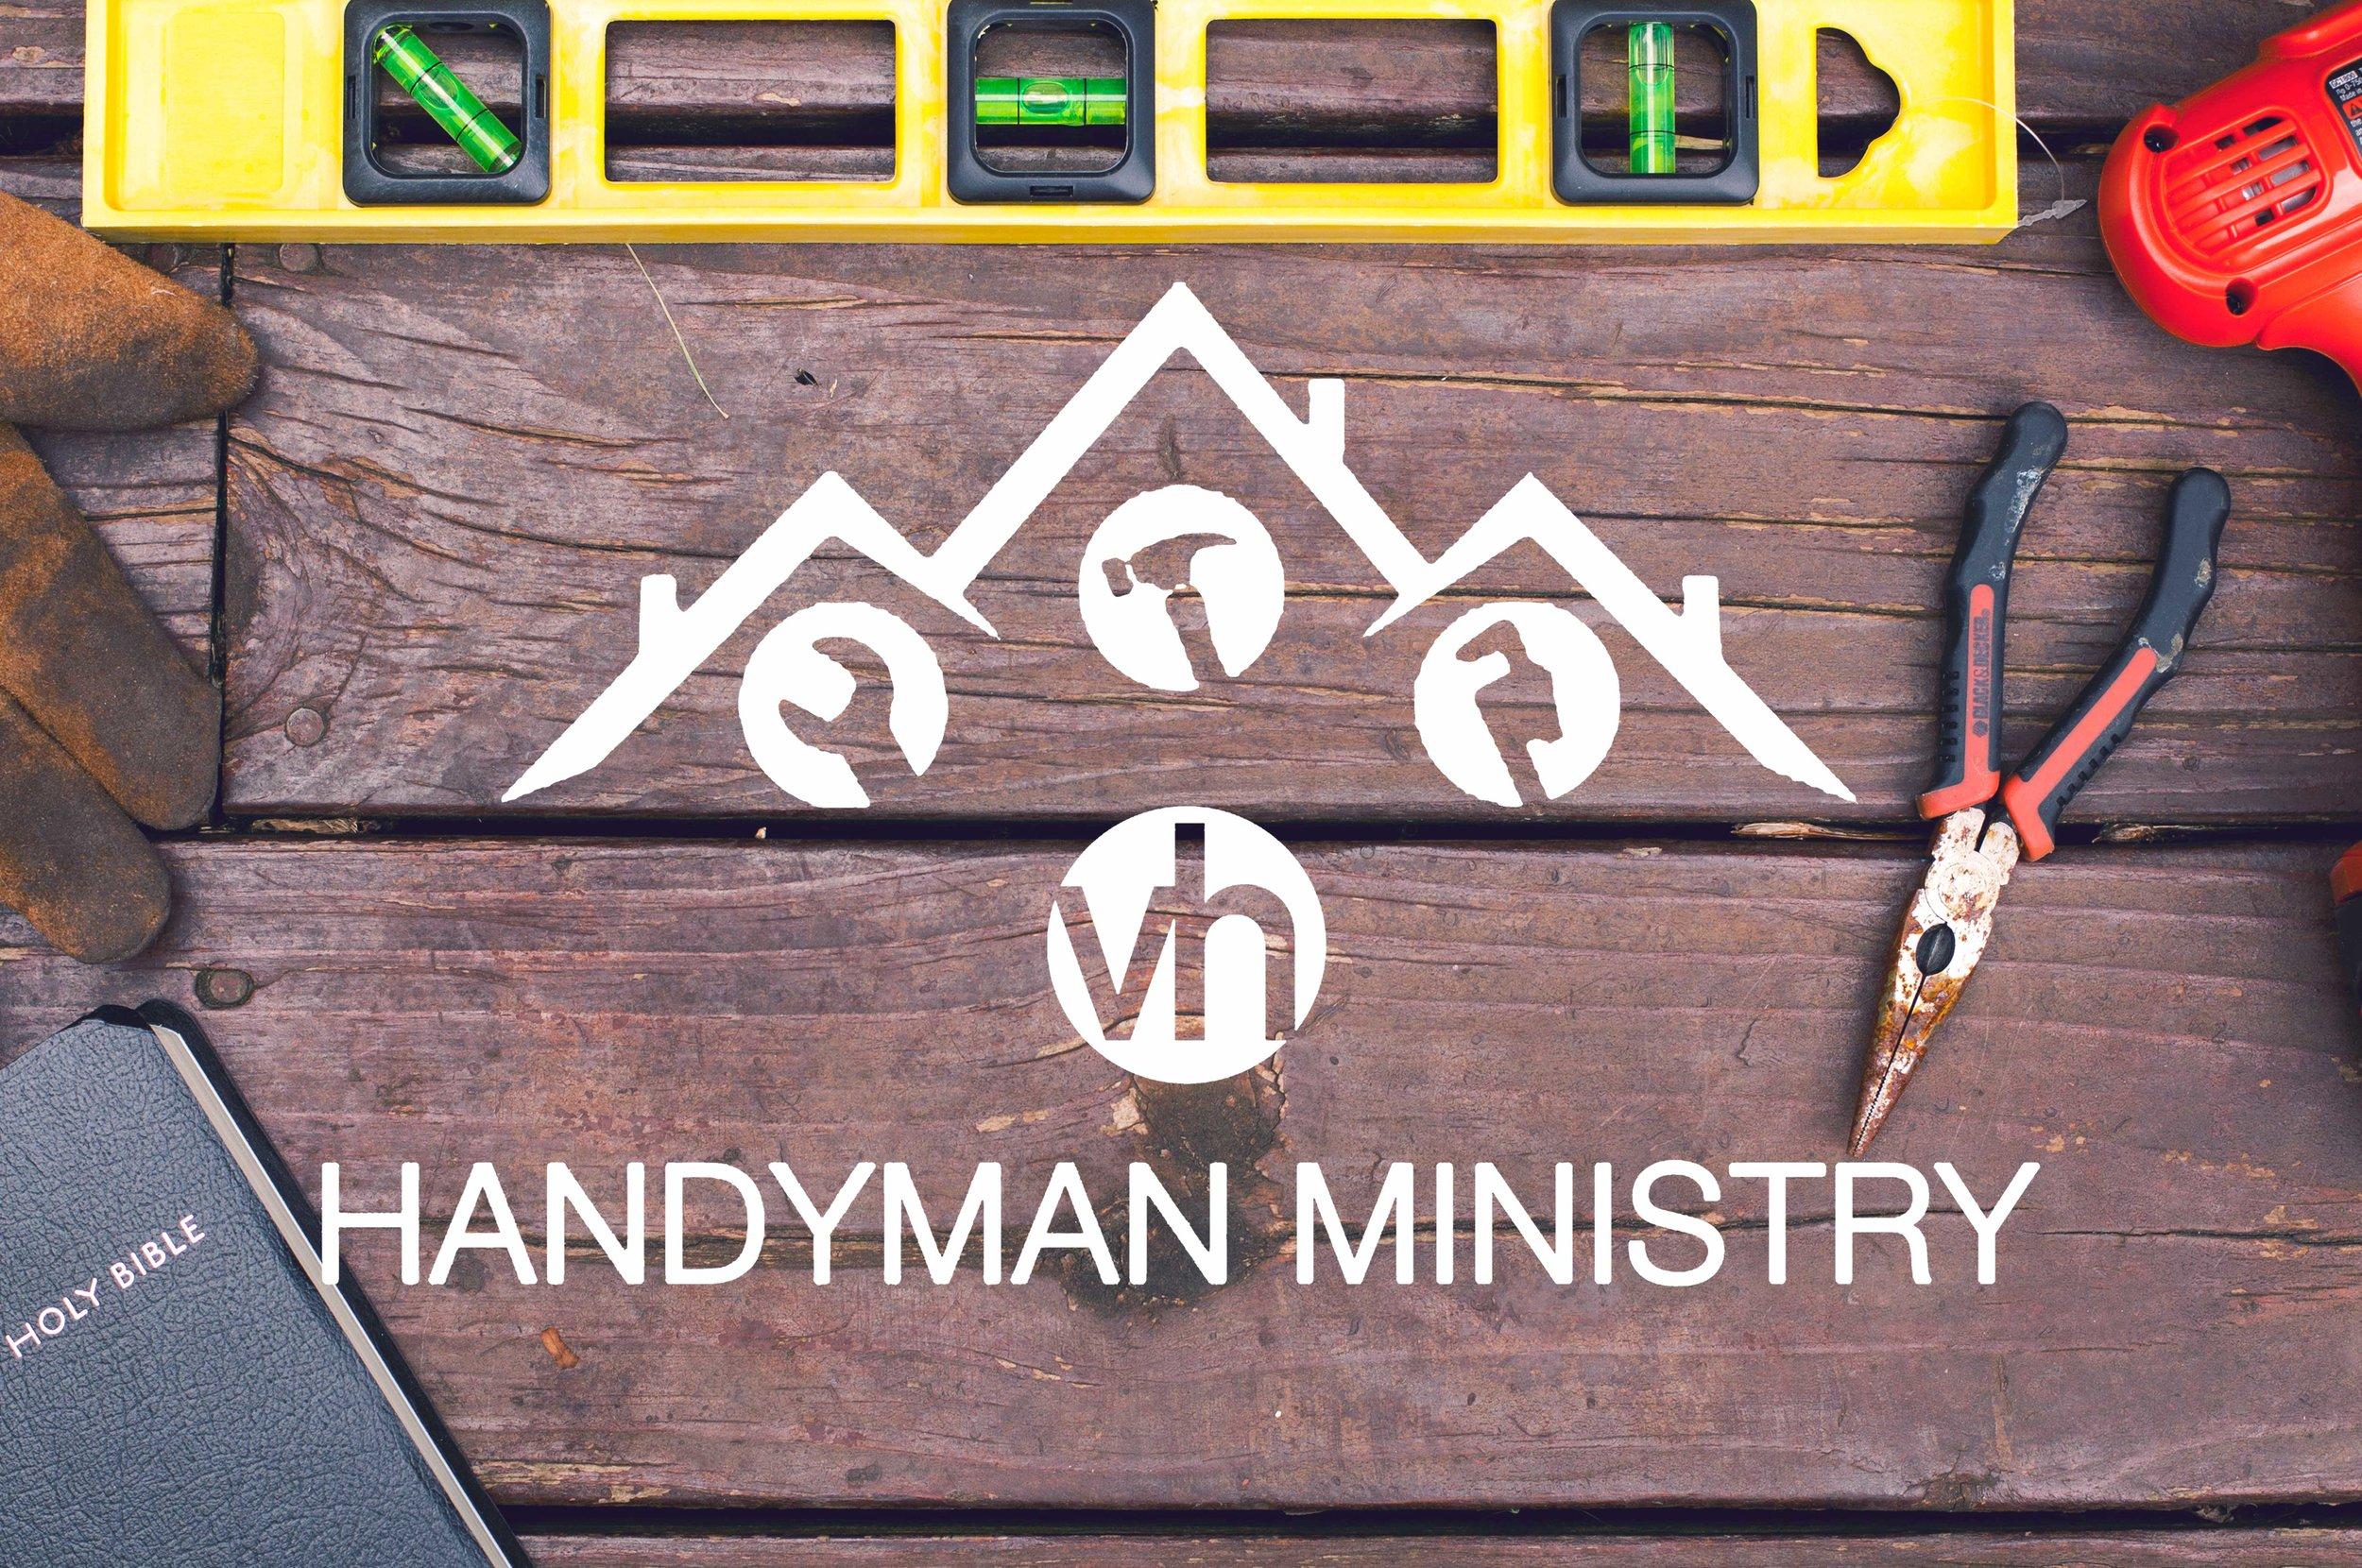 handymanministry.jpg